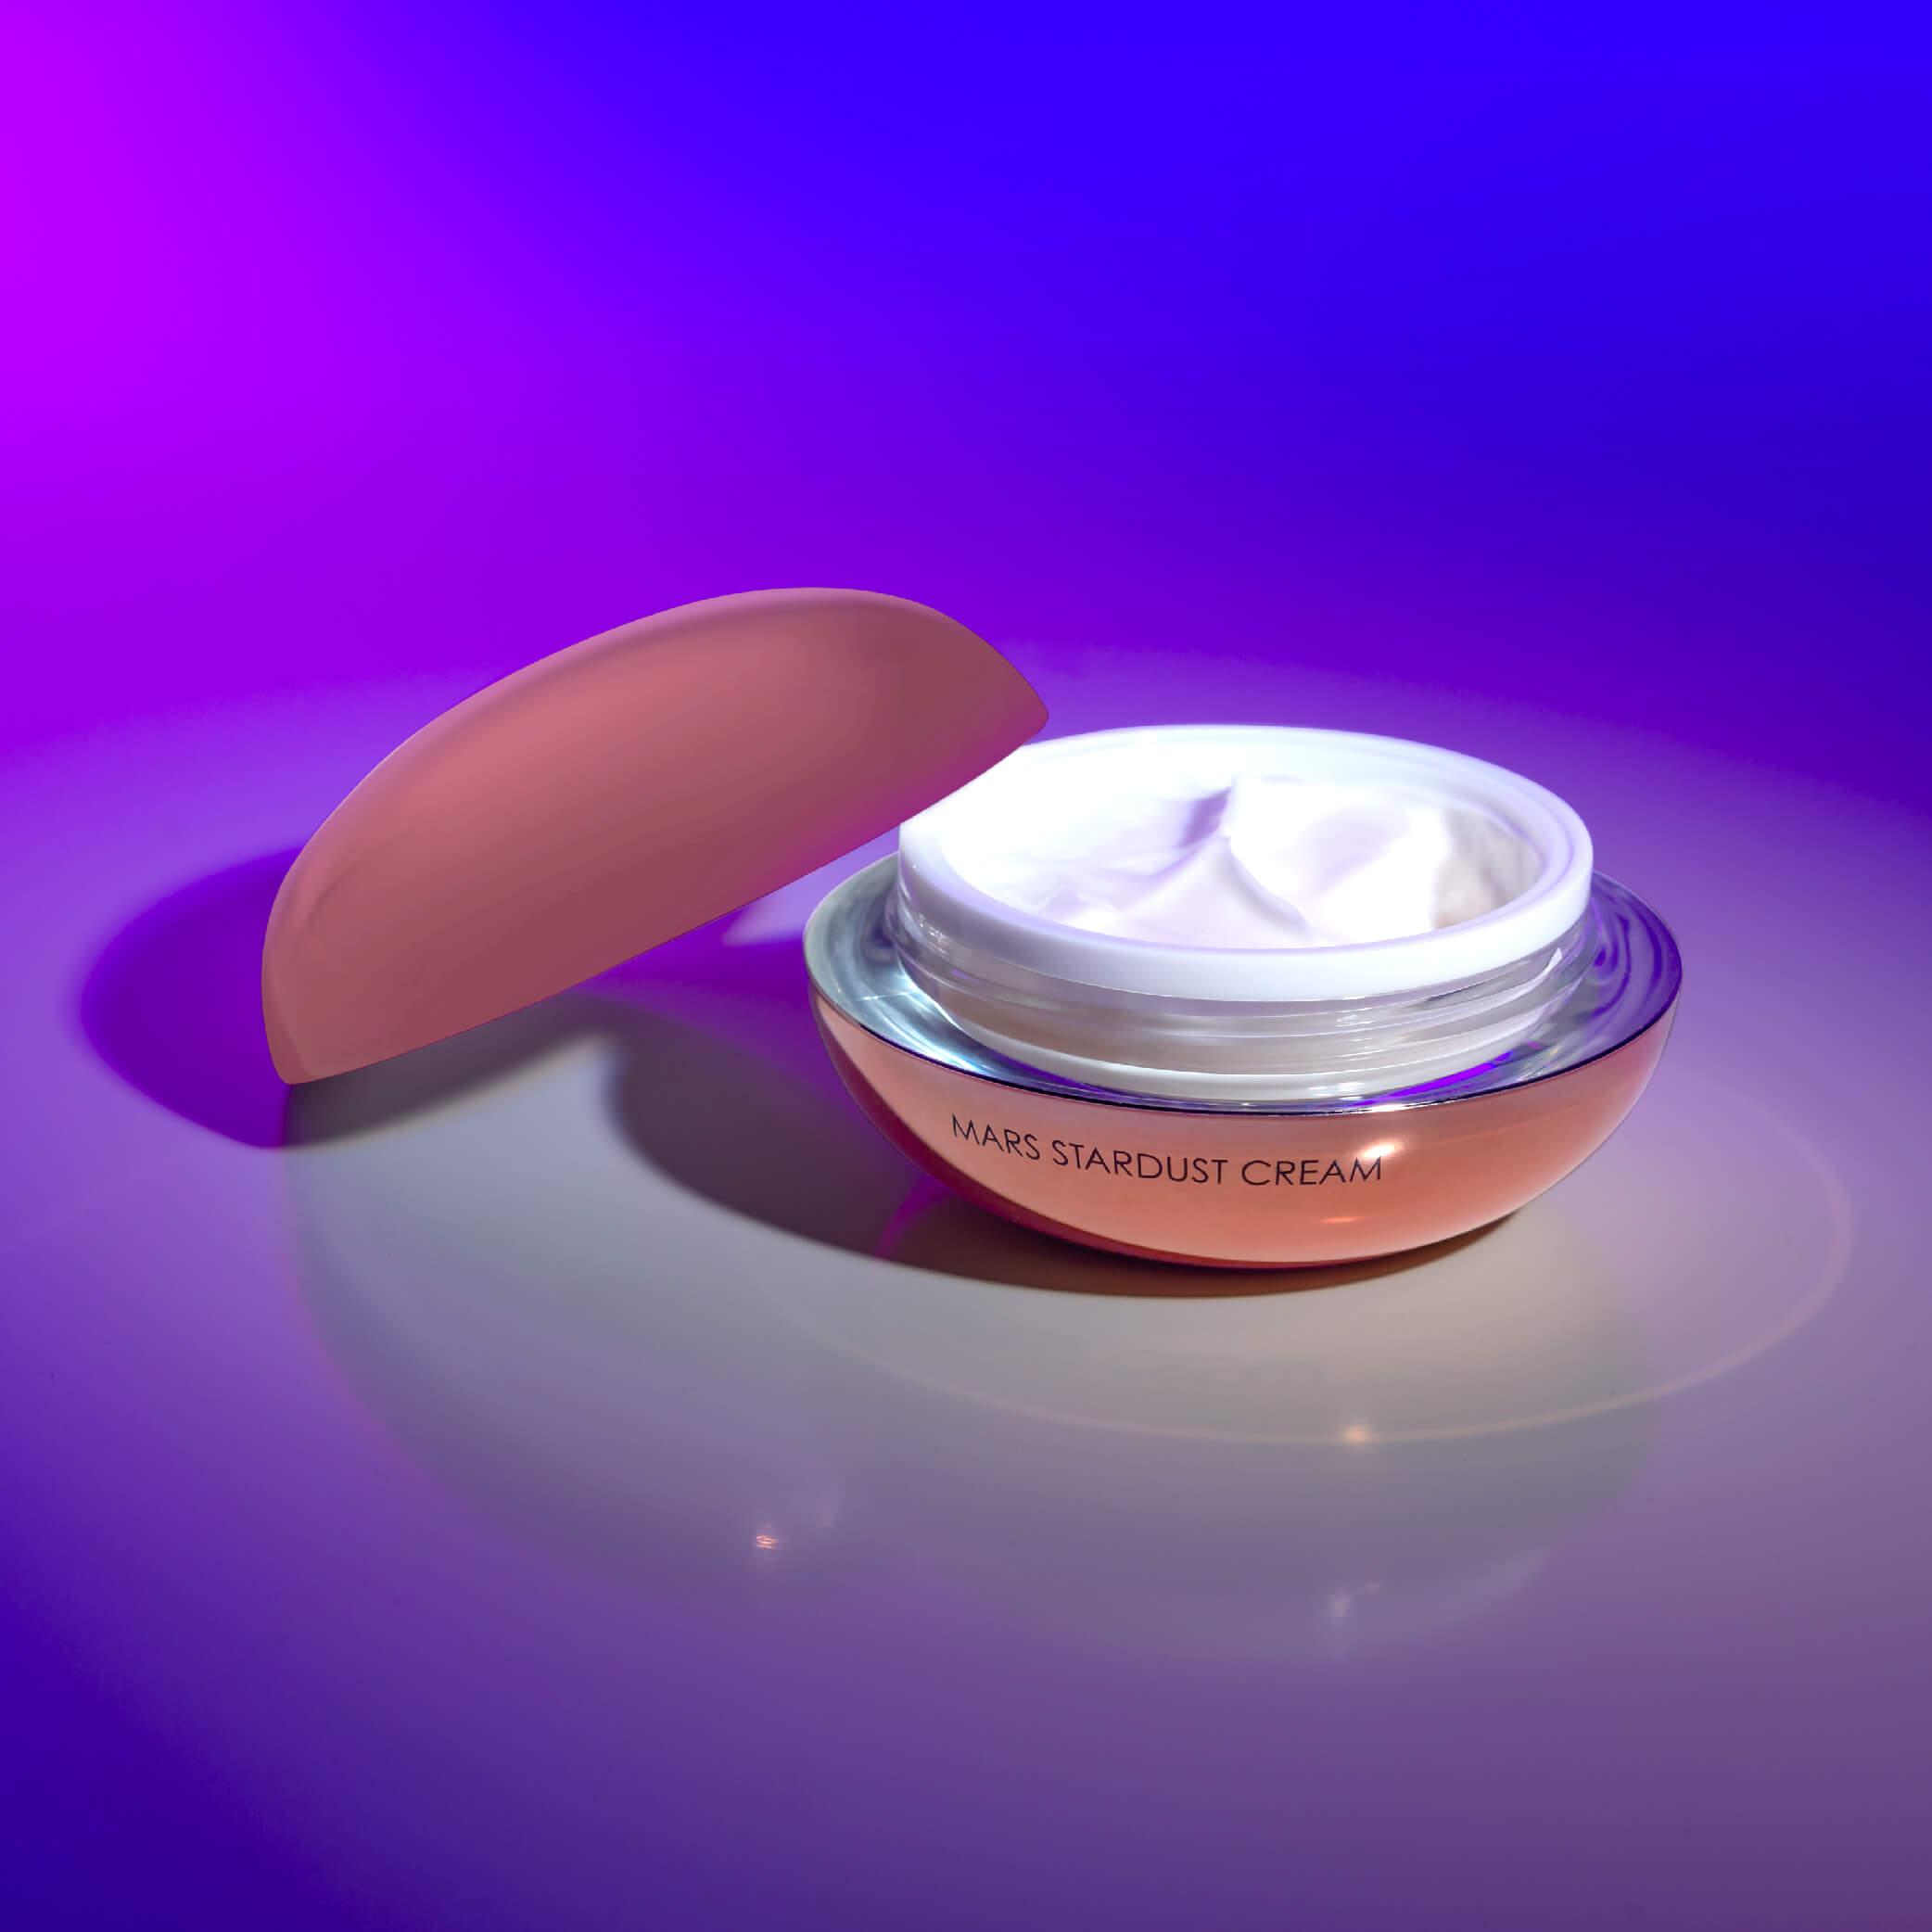 Celestolite Mars Magnetic Collection cream